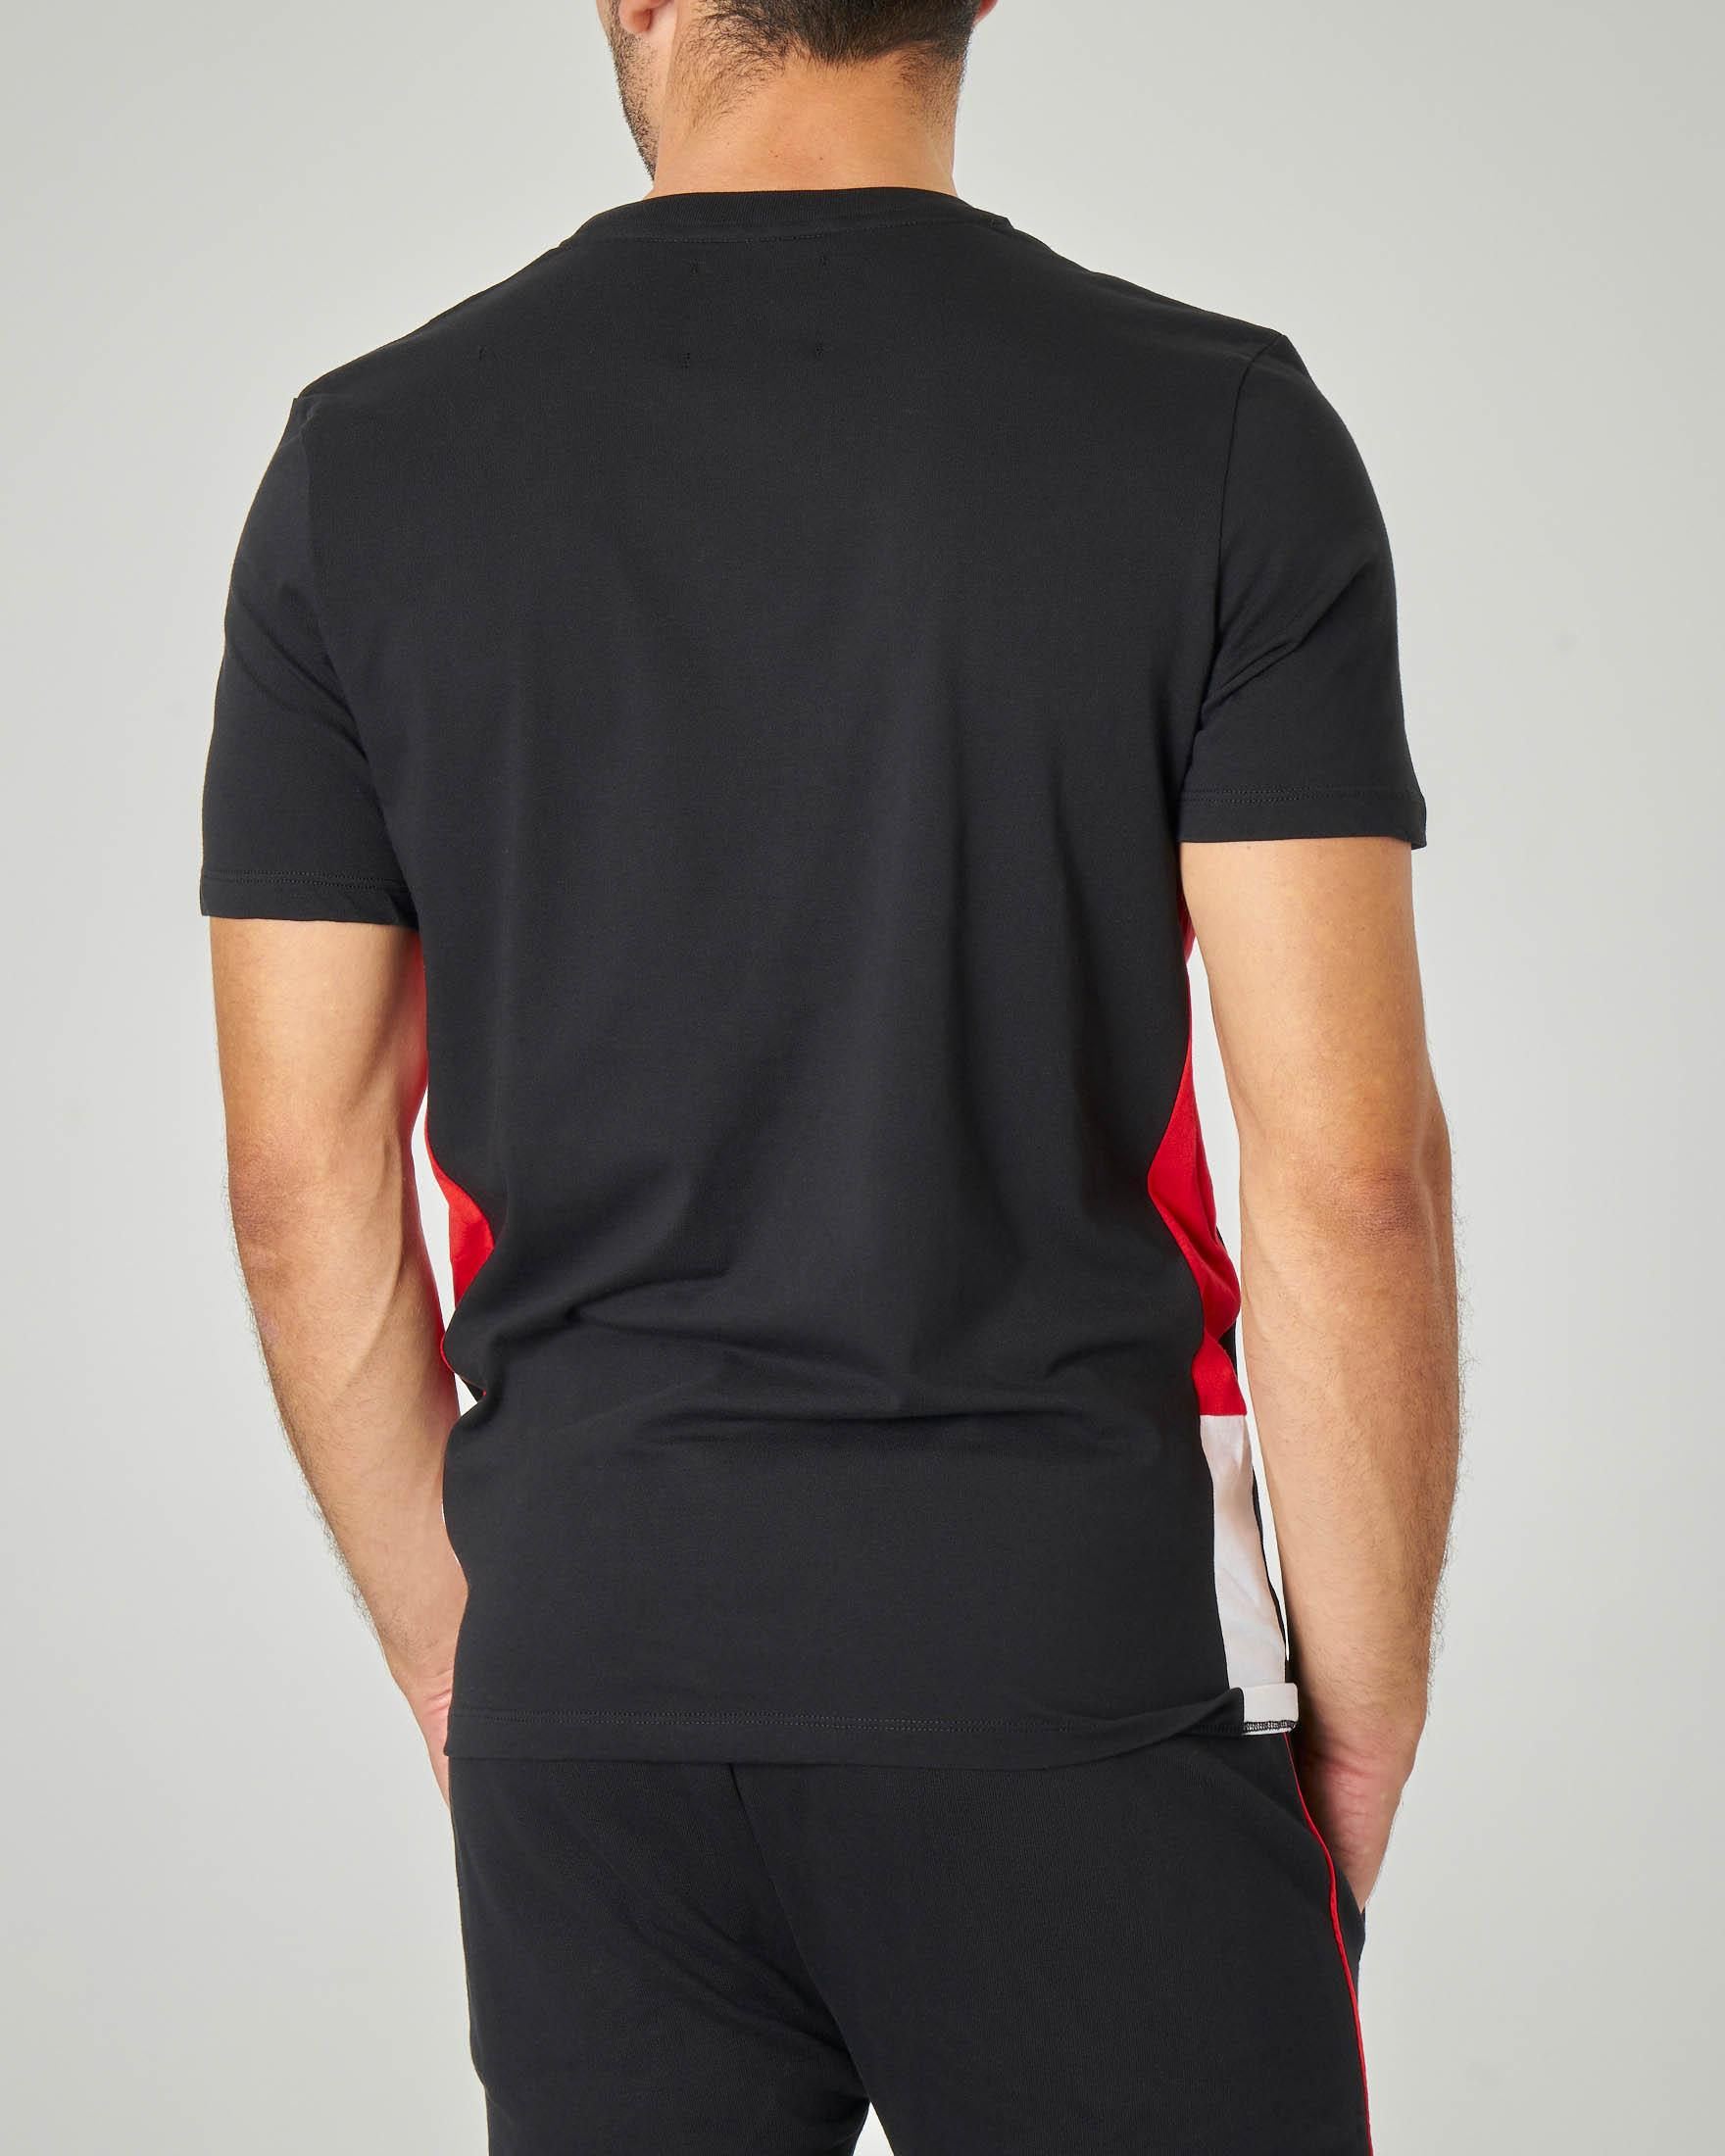 T-shirt nera con logo Pyrex in stile racing